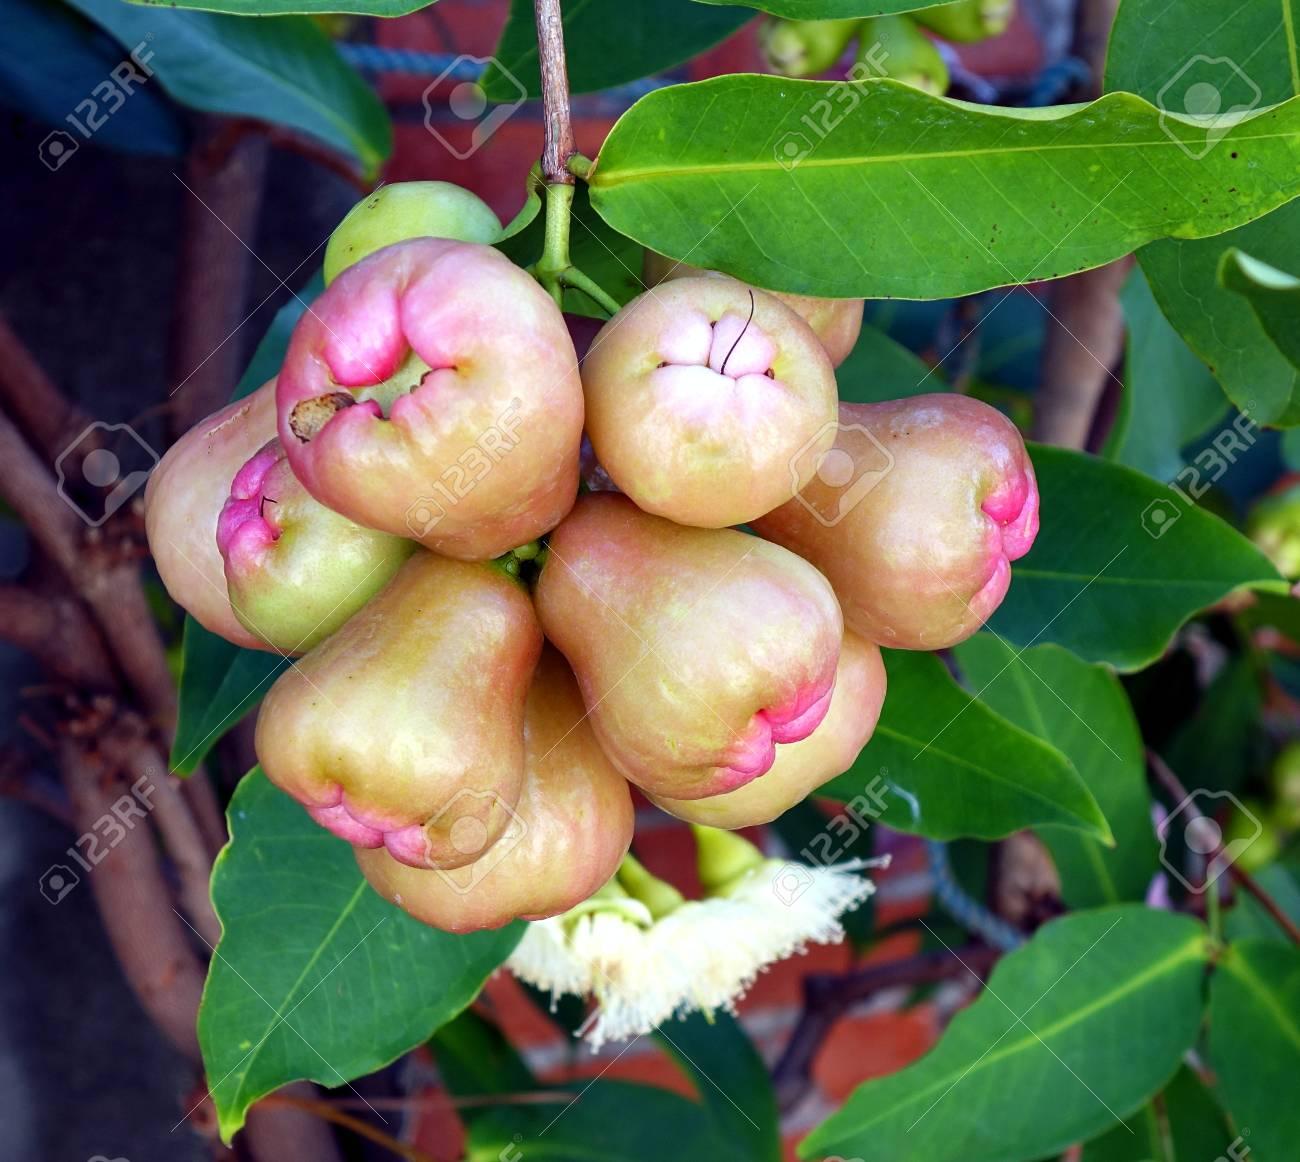 Wax apples or bell fruits (Syzygium samarangense) are a popular